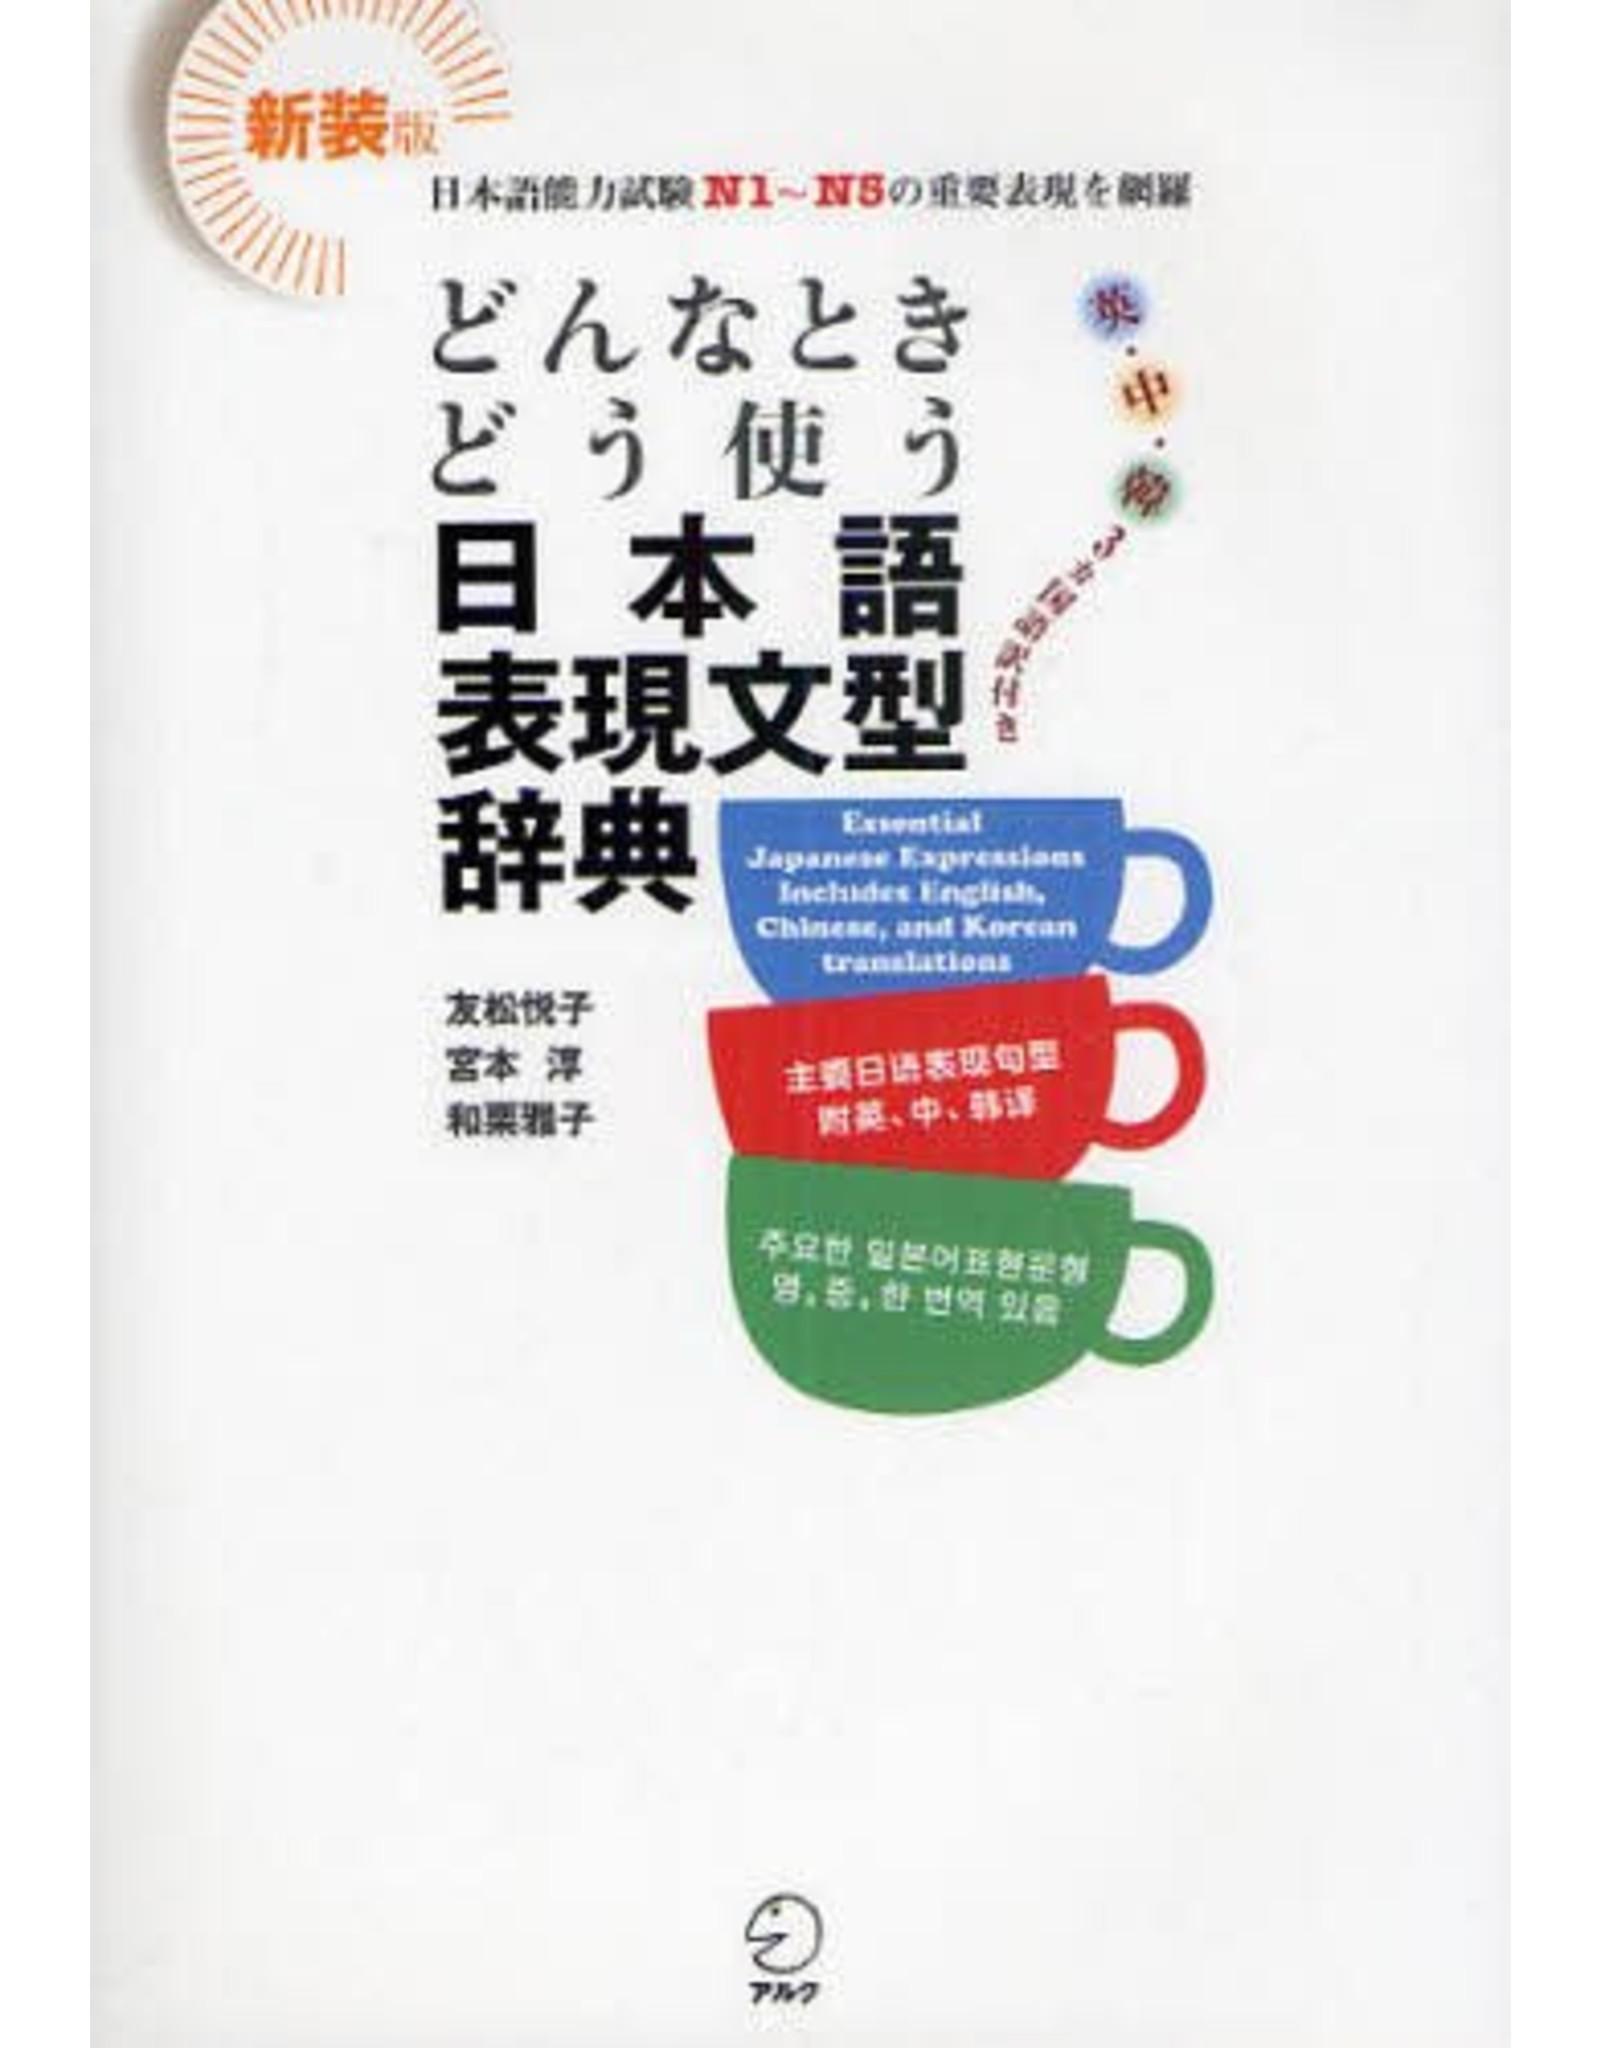 ALC [NEW EDITION] DONNA TOKI DO TSUKAU NIHONGO HYOGEN BUNKEI JITEN - 500 ESSENTIAL JAPANESE EXPRESSIONS DICTIONARY